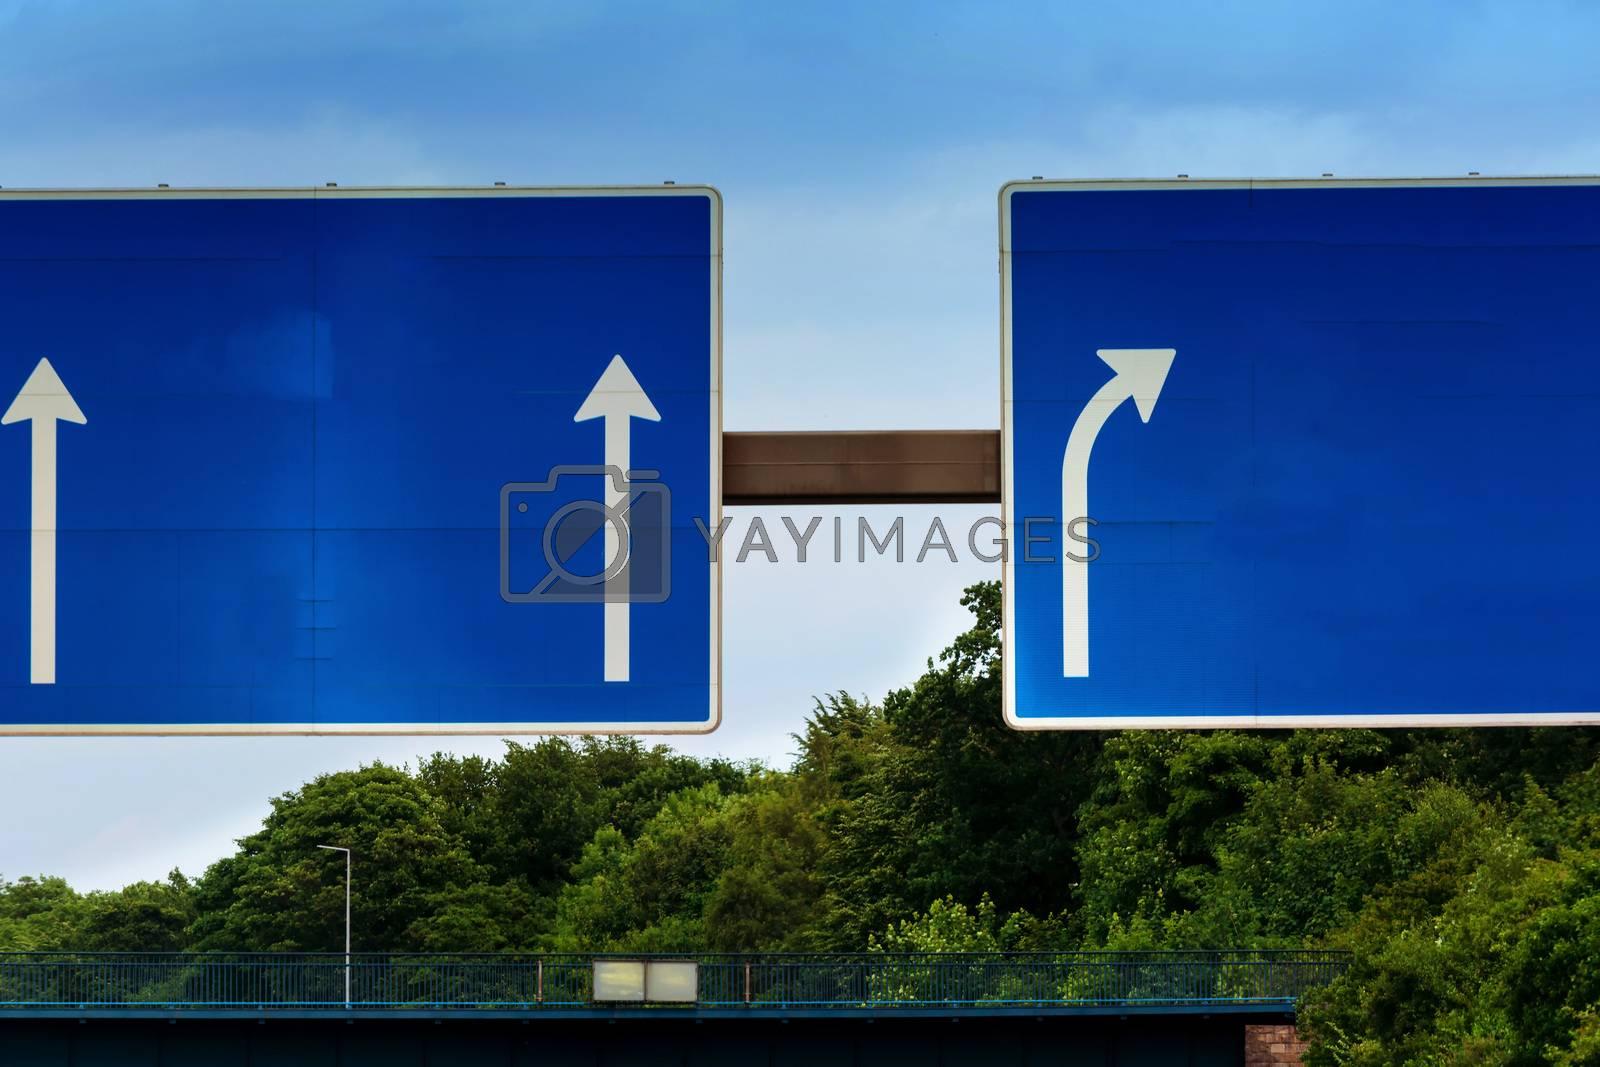 Highway sign, directional sign on the motorway A 3, direction Venlo, Duisburg, Essen, Muelheim an der Ruhr, Oberhausen, Arnhem and Highway crossing Kaiserberg.